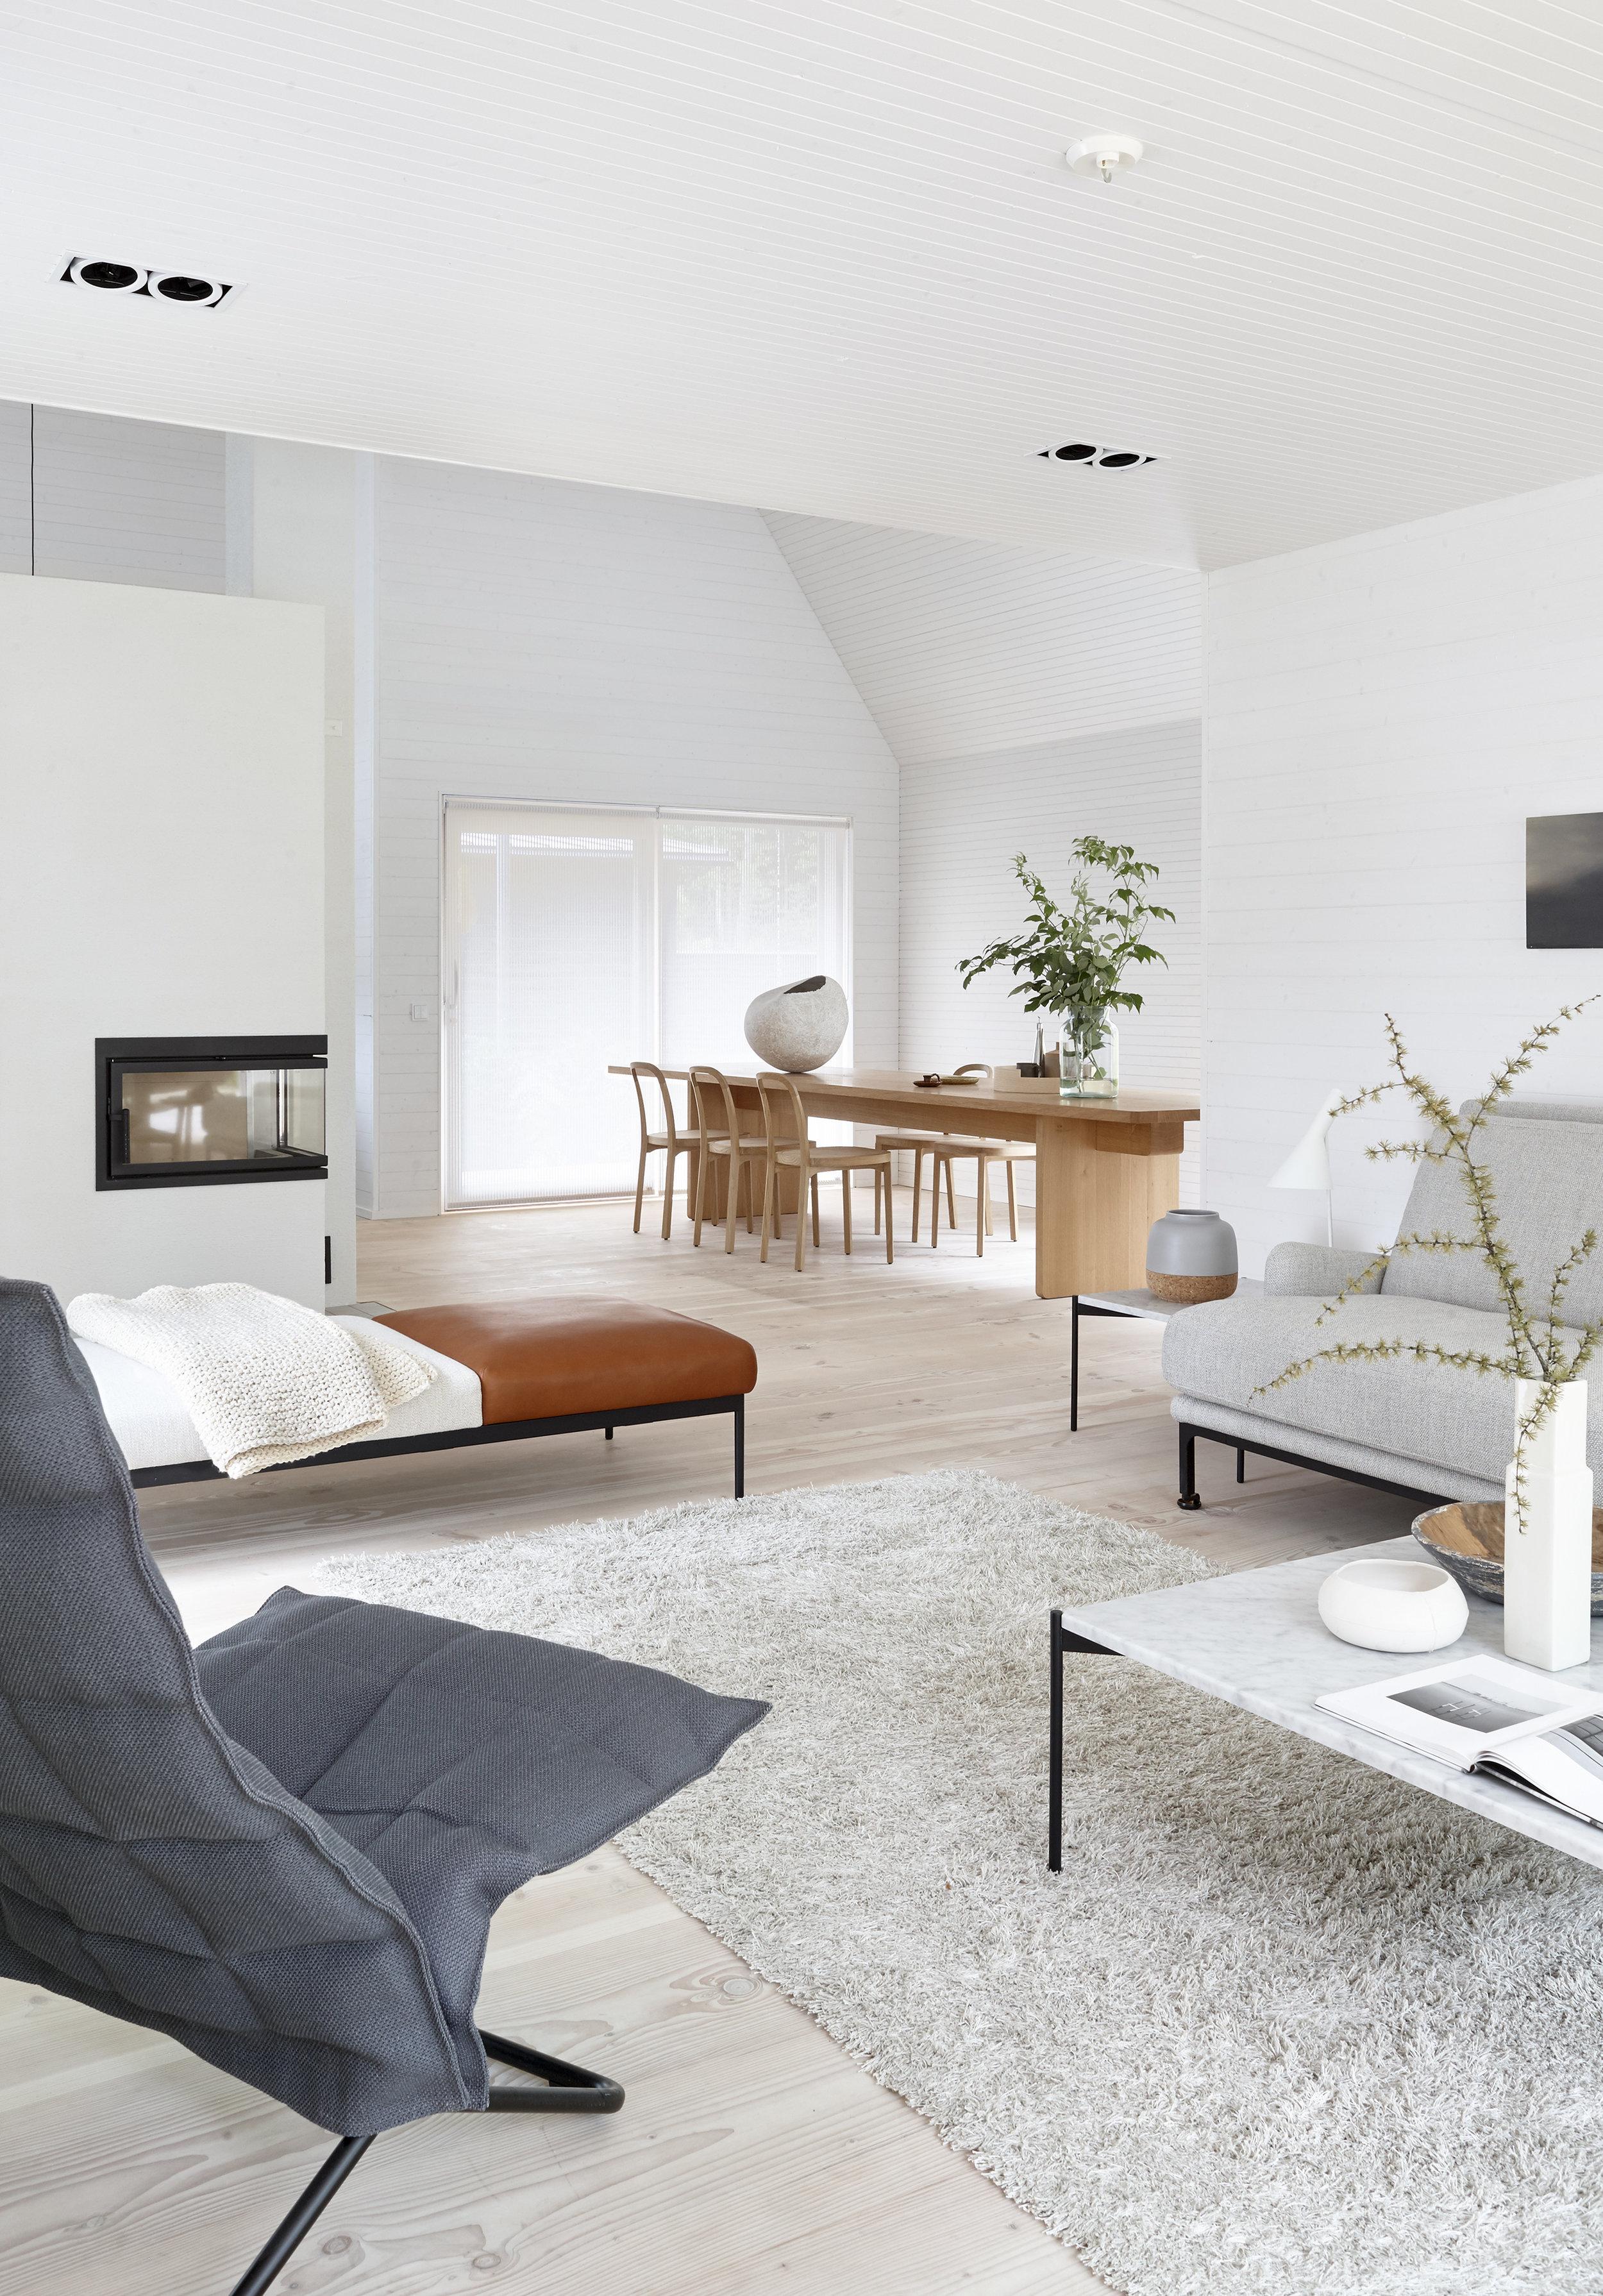 1640115  Wild  light grey tufted carpet, 46003  Narrow Tubular k Chair , 4400  Siro+  chairs